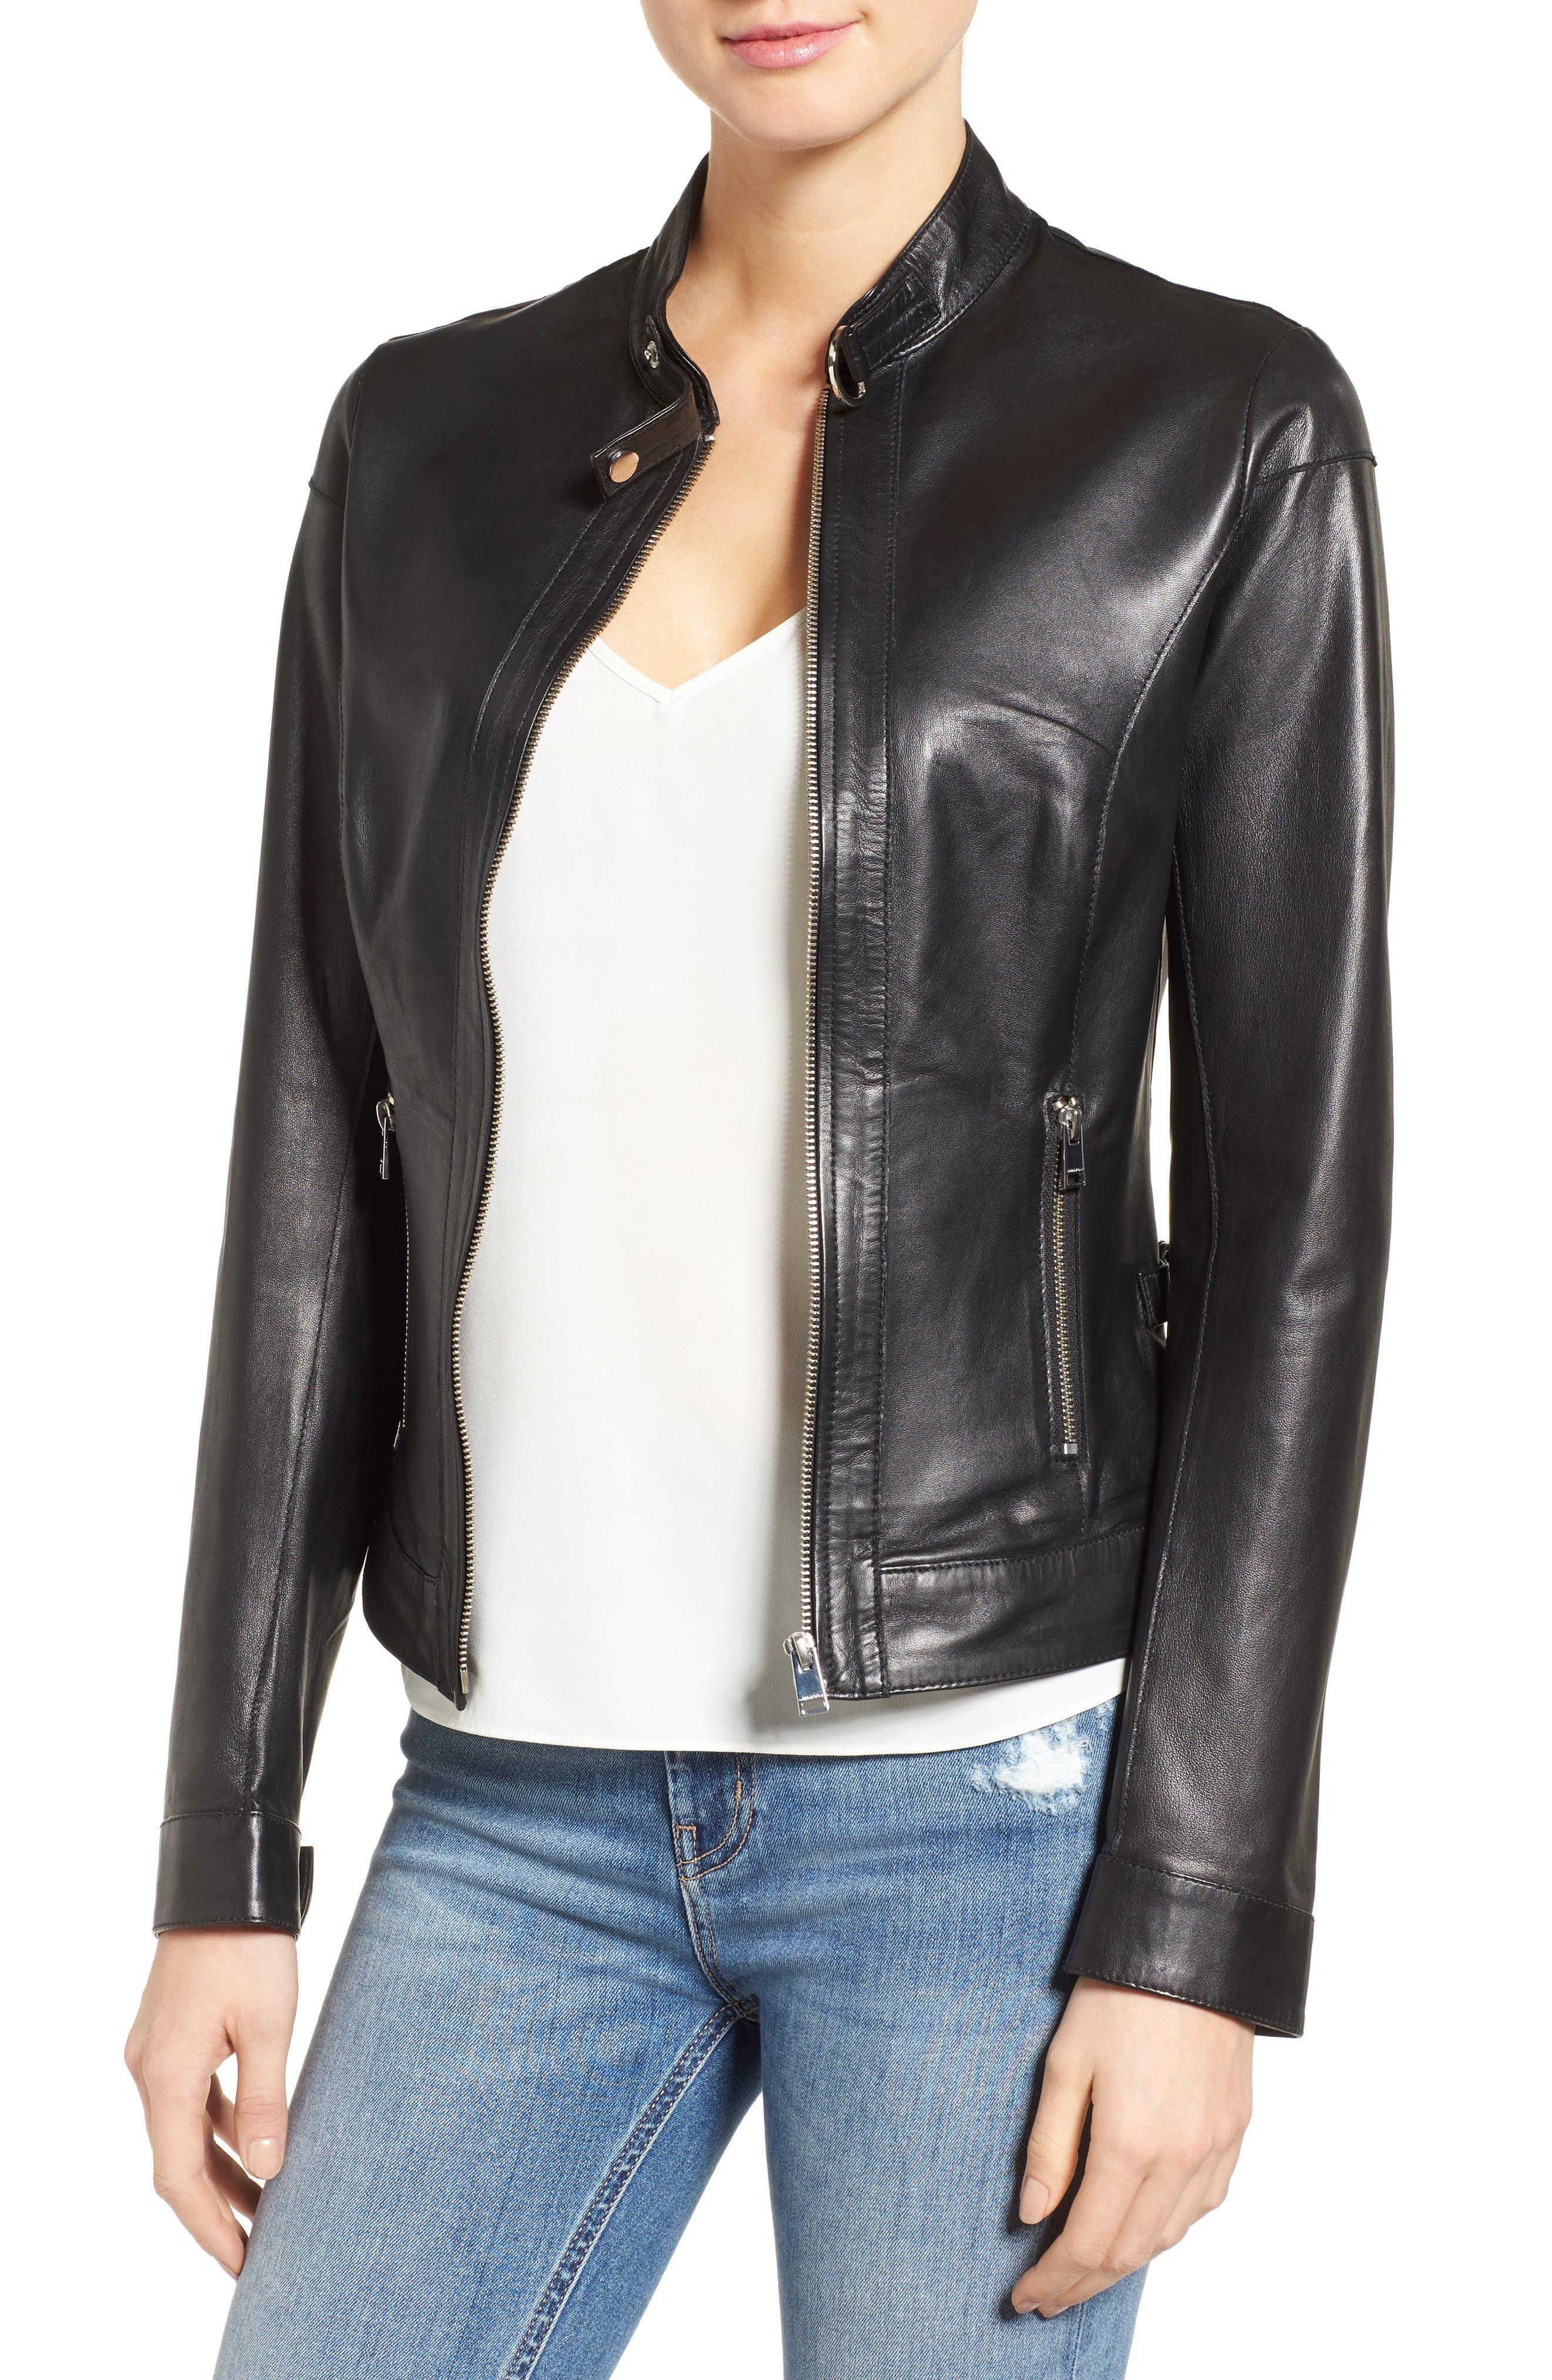 Main Image - LAMARQUE Lambskin Leather Biker Jacket